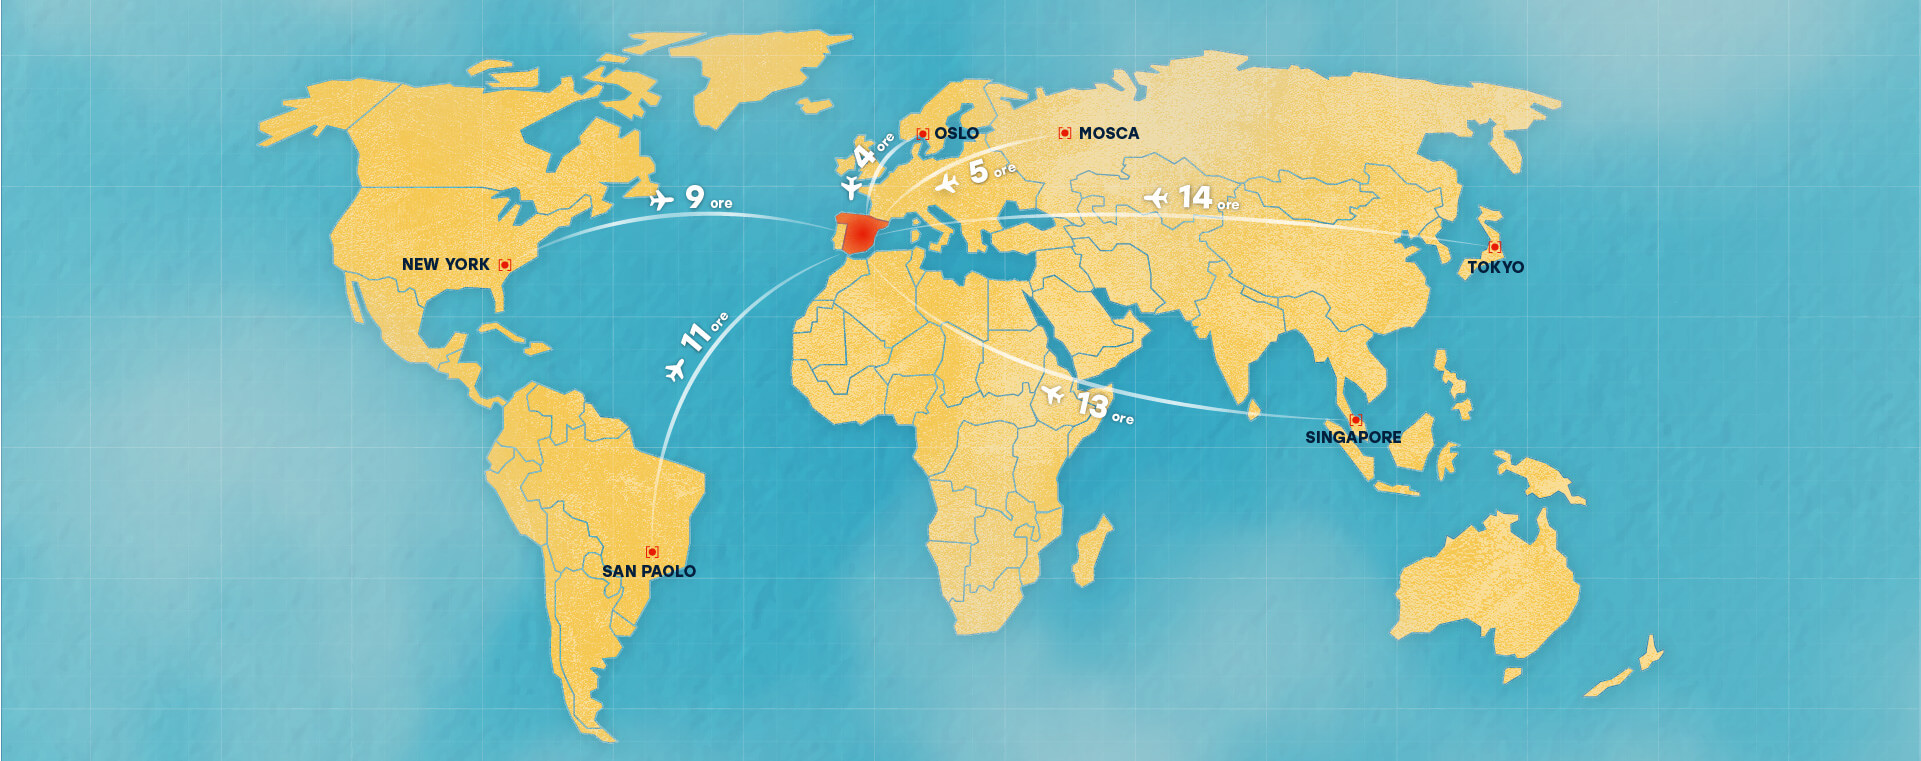 Aeroporti norvegia Cartina